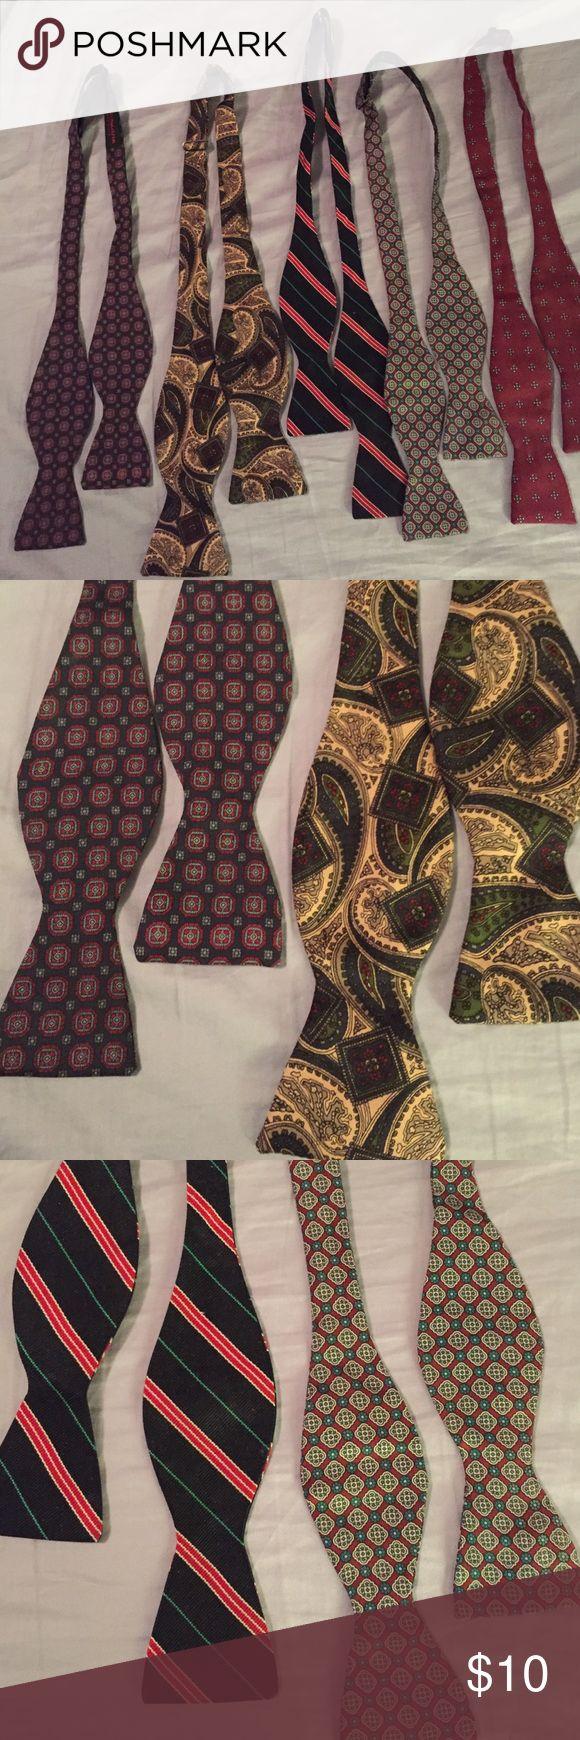 Five men's bow ties Men's bow ties of various patterns, adjustable neck sizes Accessories Ties